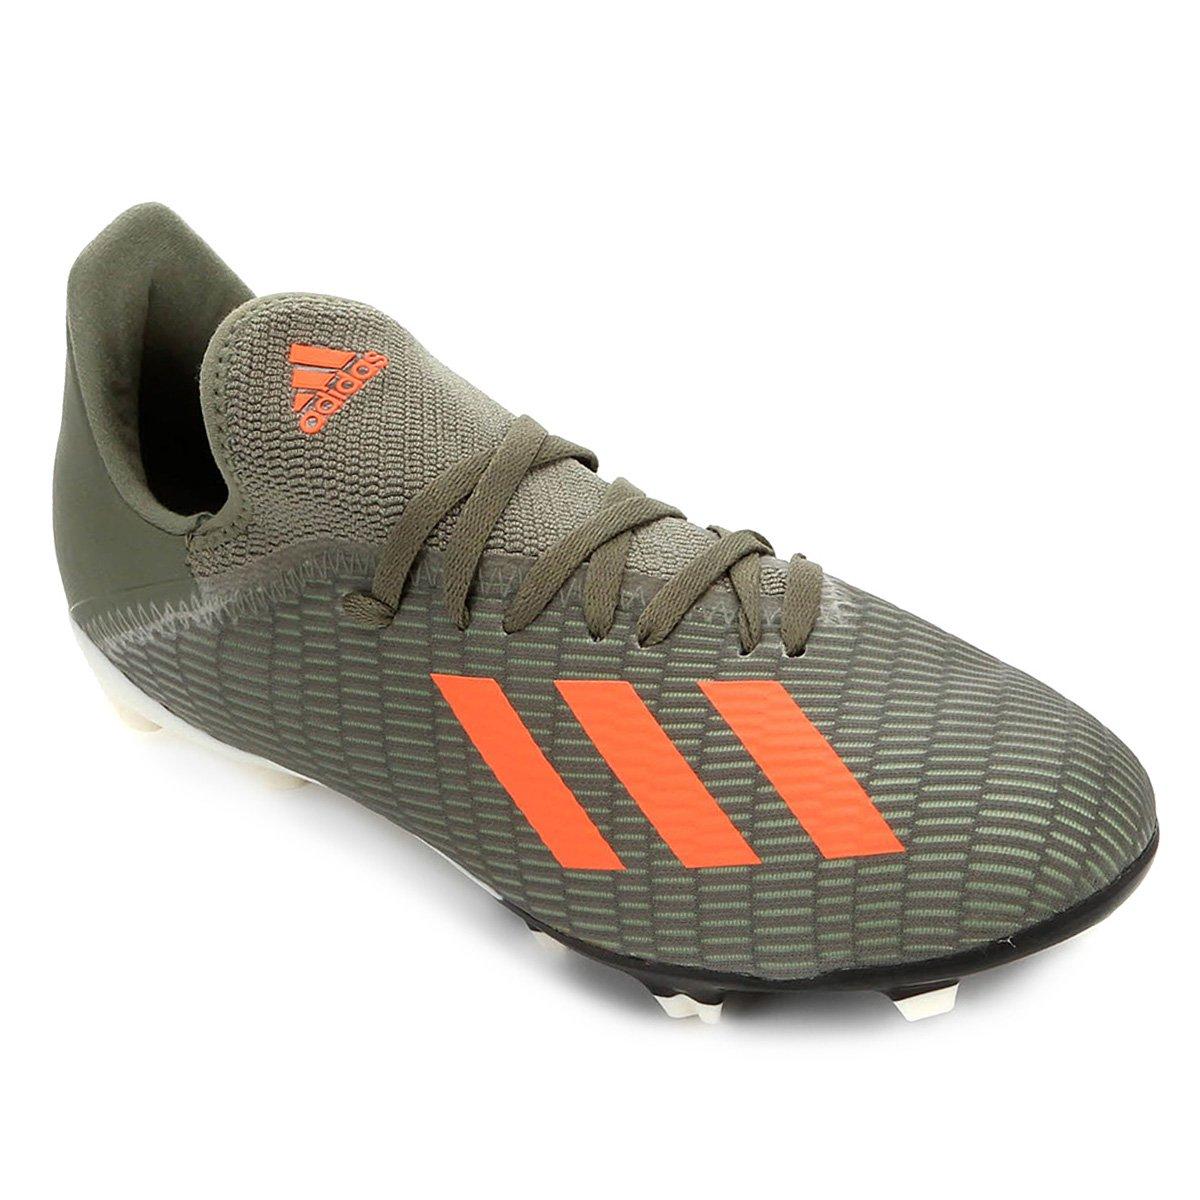 Chuteira Campo Juvenil Adidas X 19 3 FG